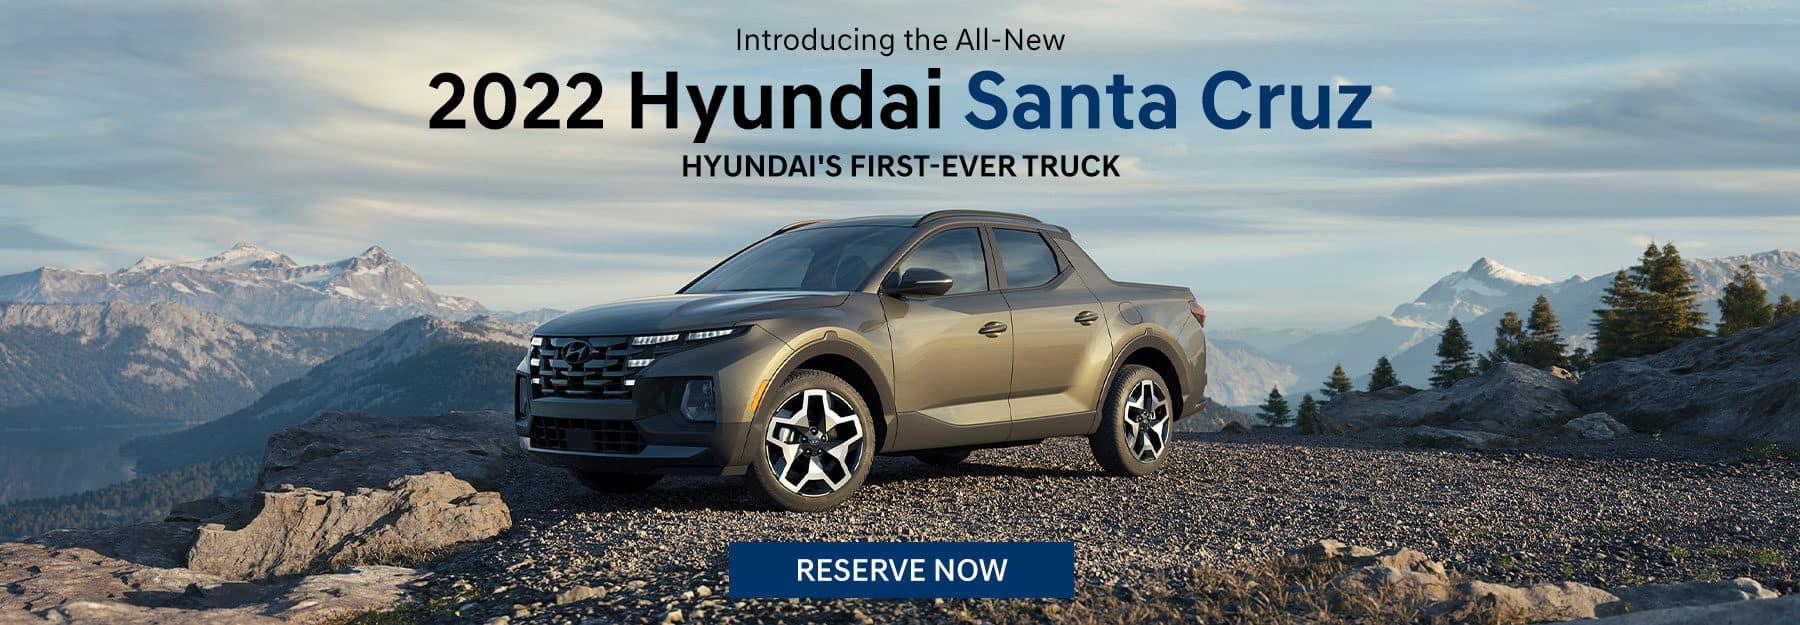 Reserve 2022 Hyundai Santa Cruz in Greenville, TX